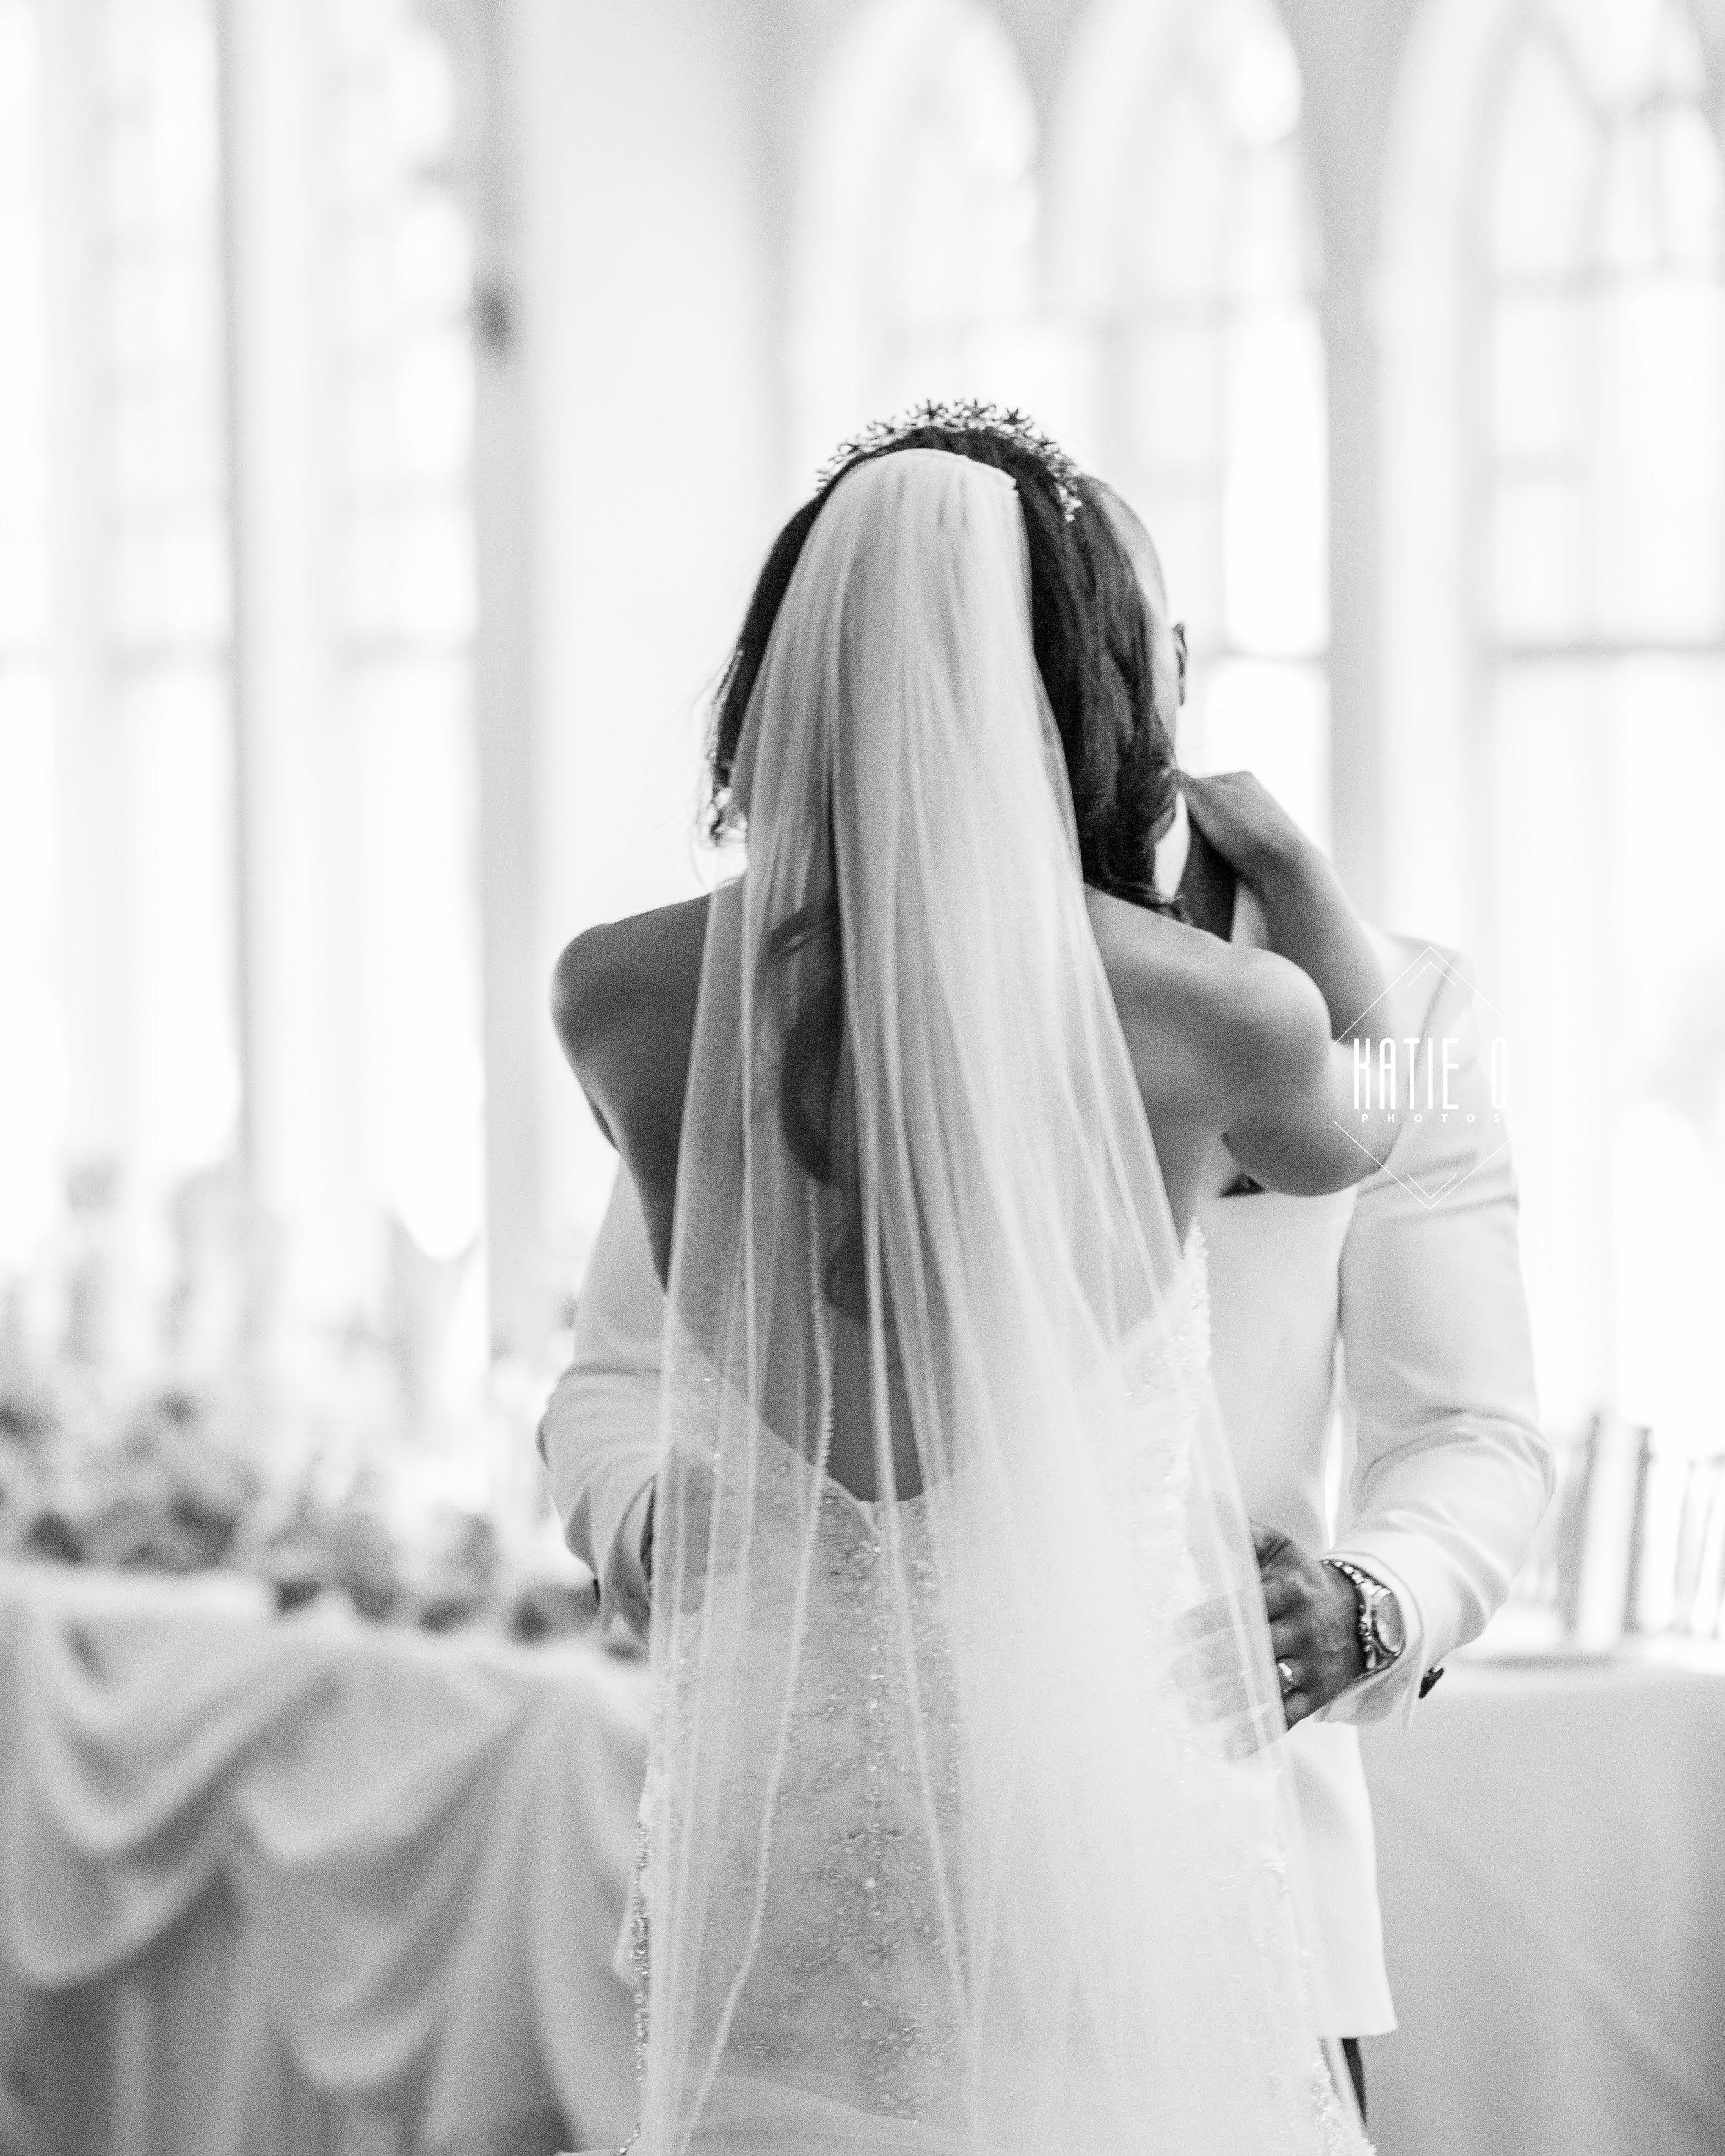 CT-WEDDING-PHOTOGRAPHER-BLOG-34.jpg